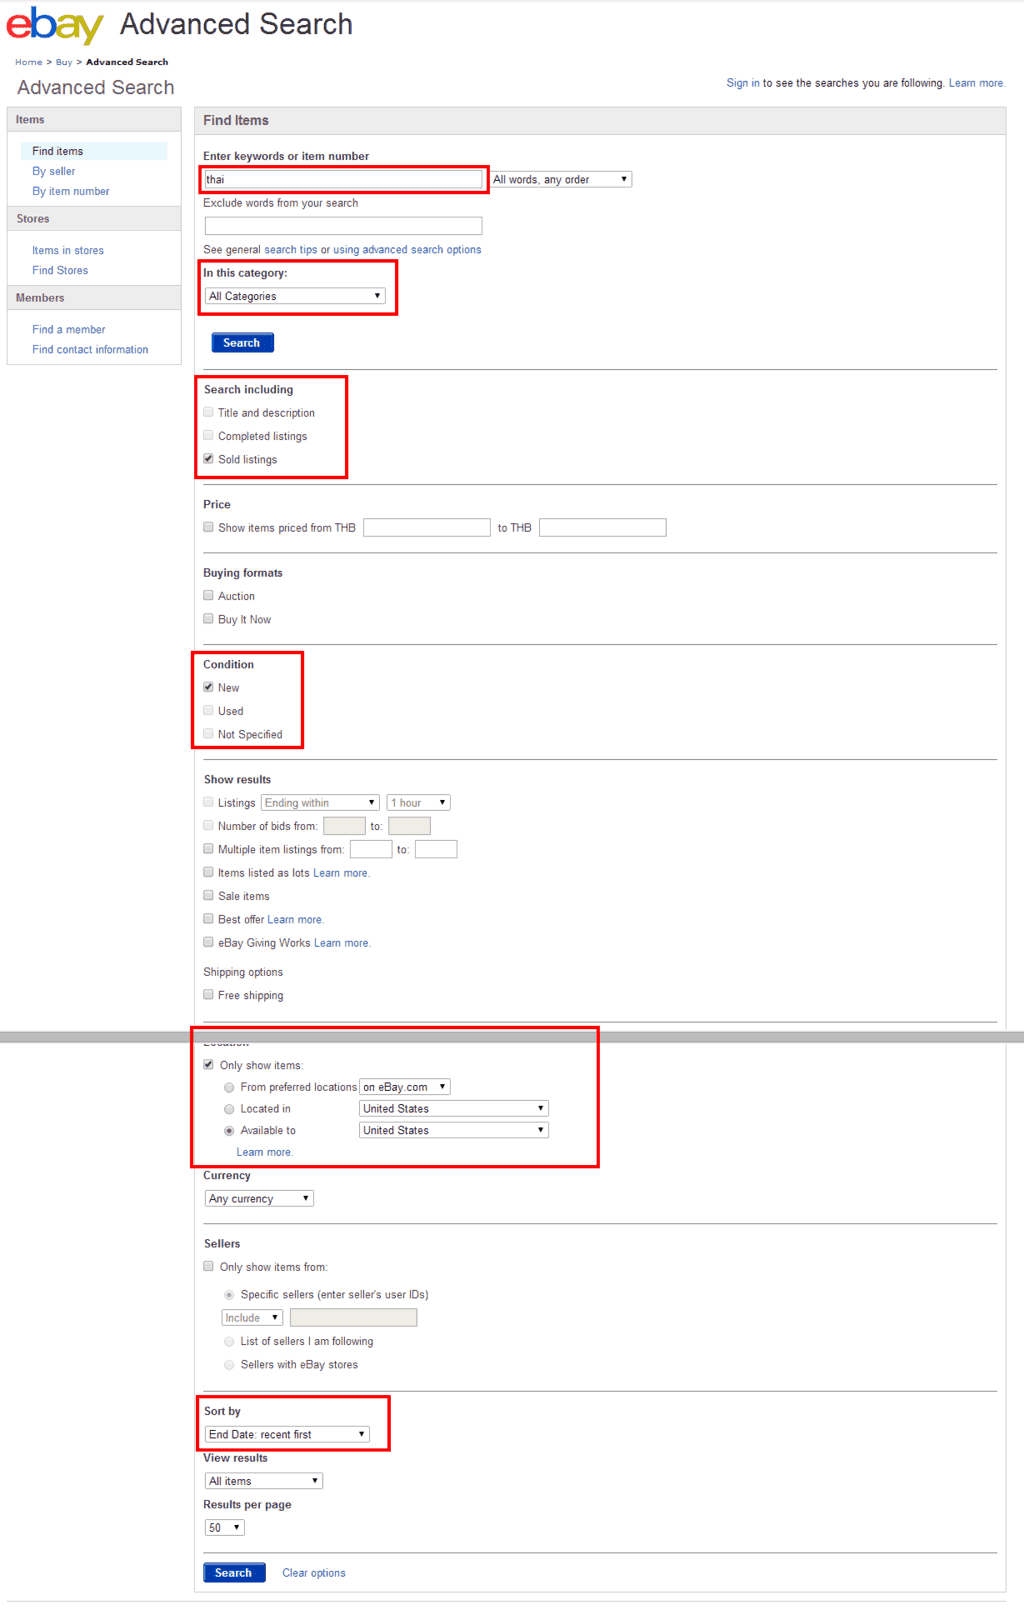 eBay Search Advanced Search